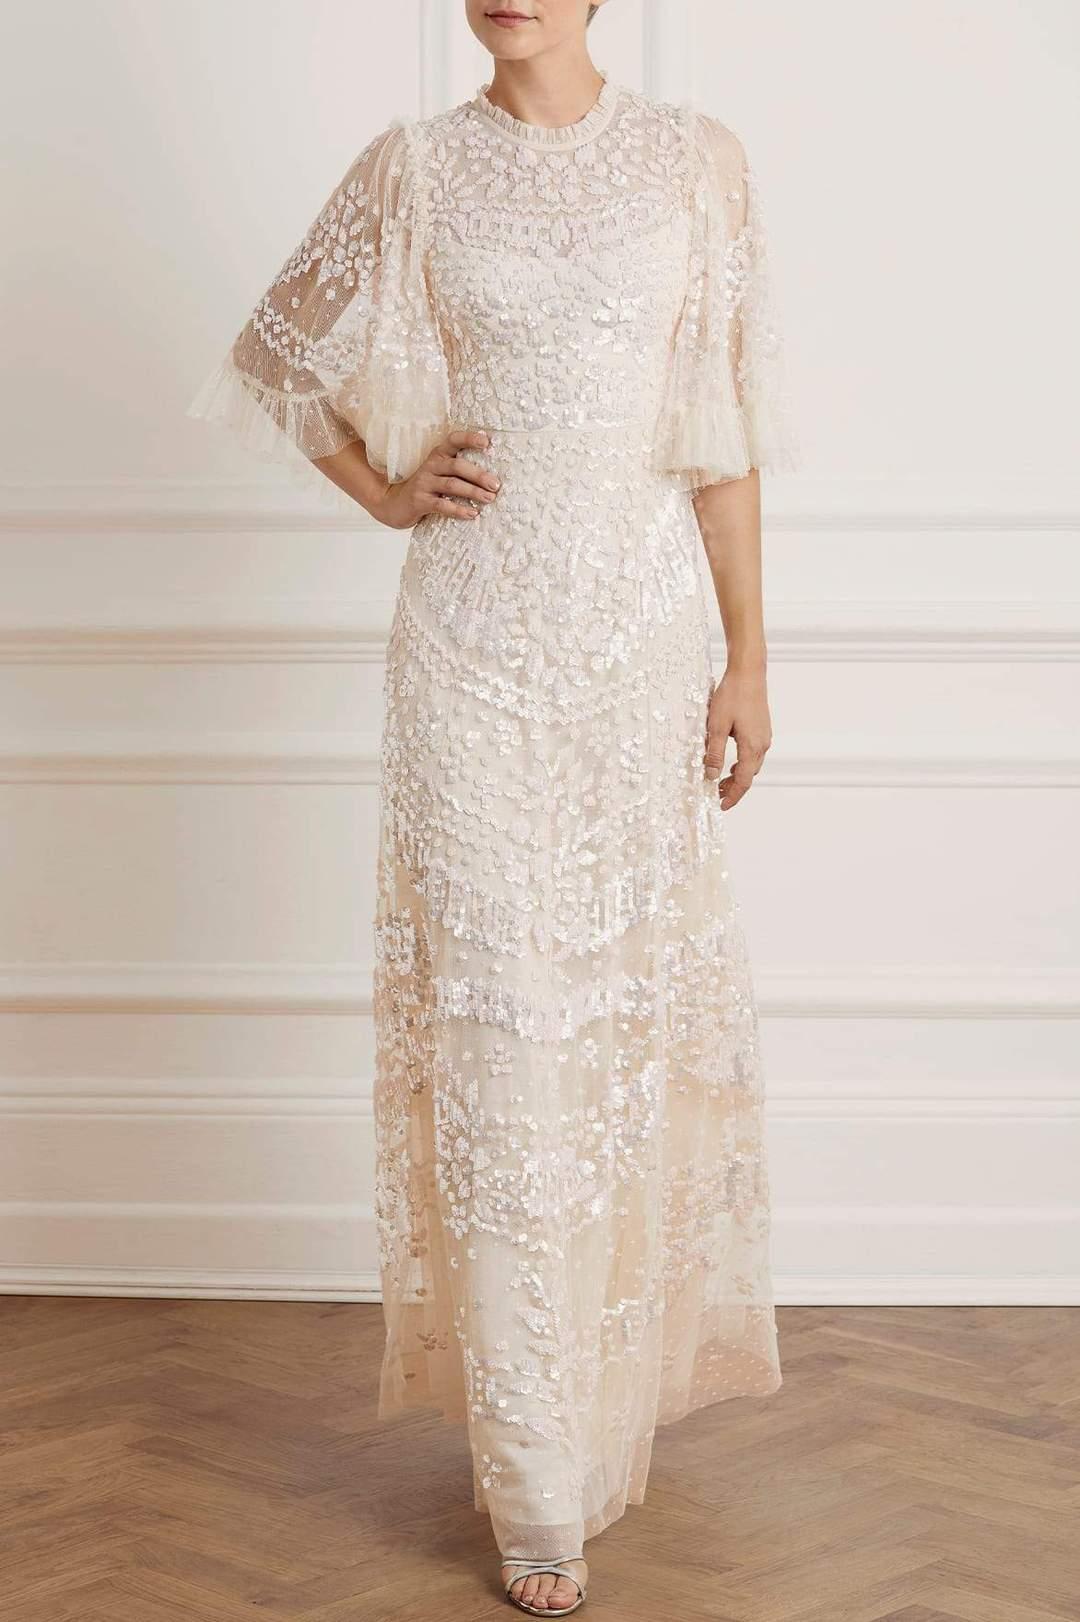 Needle and thread wedding dress.